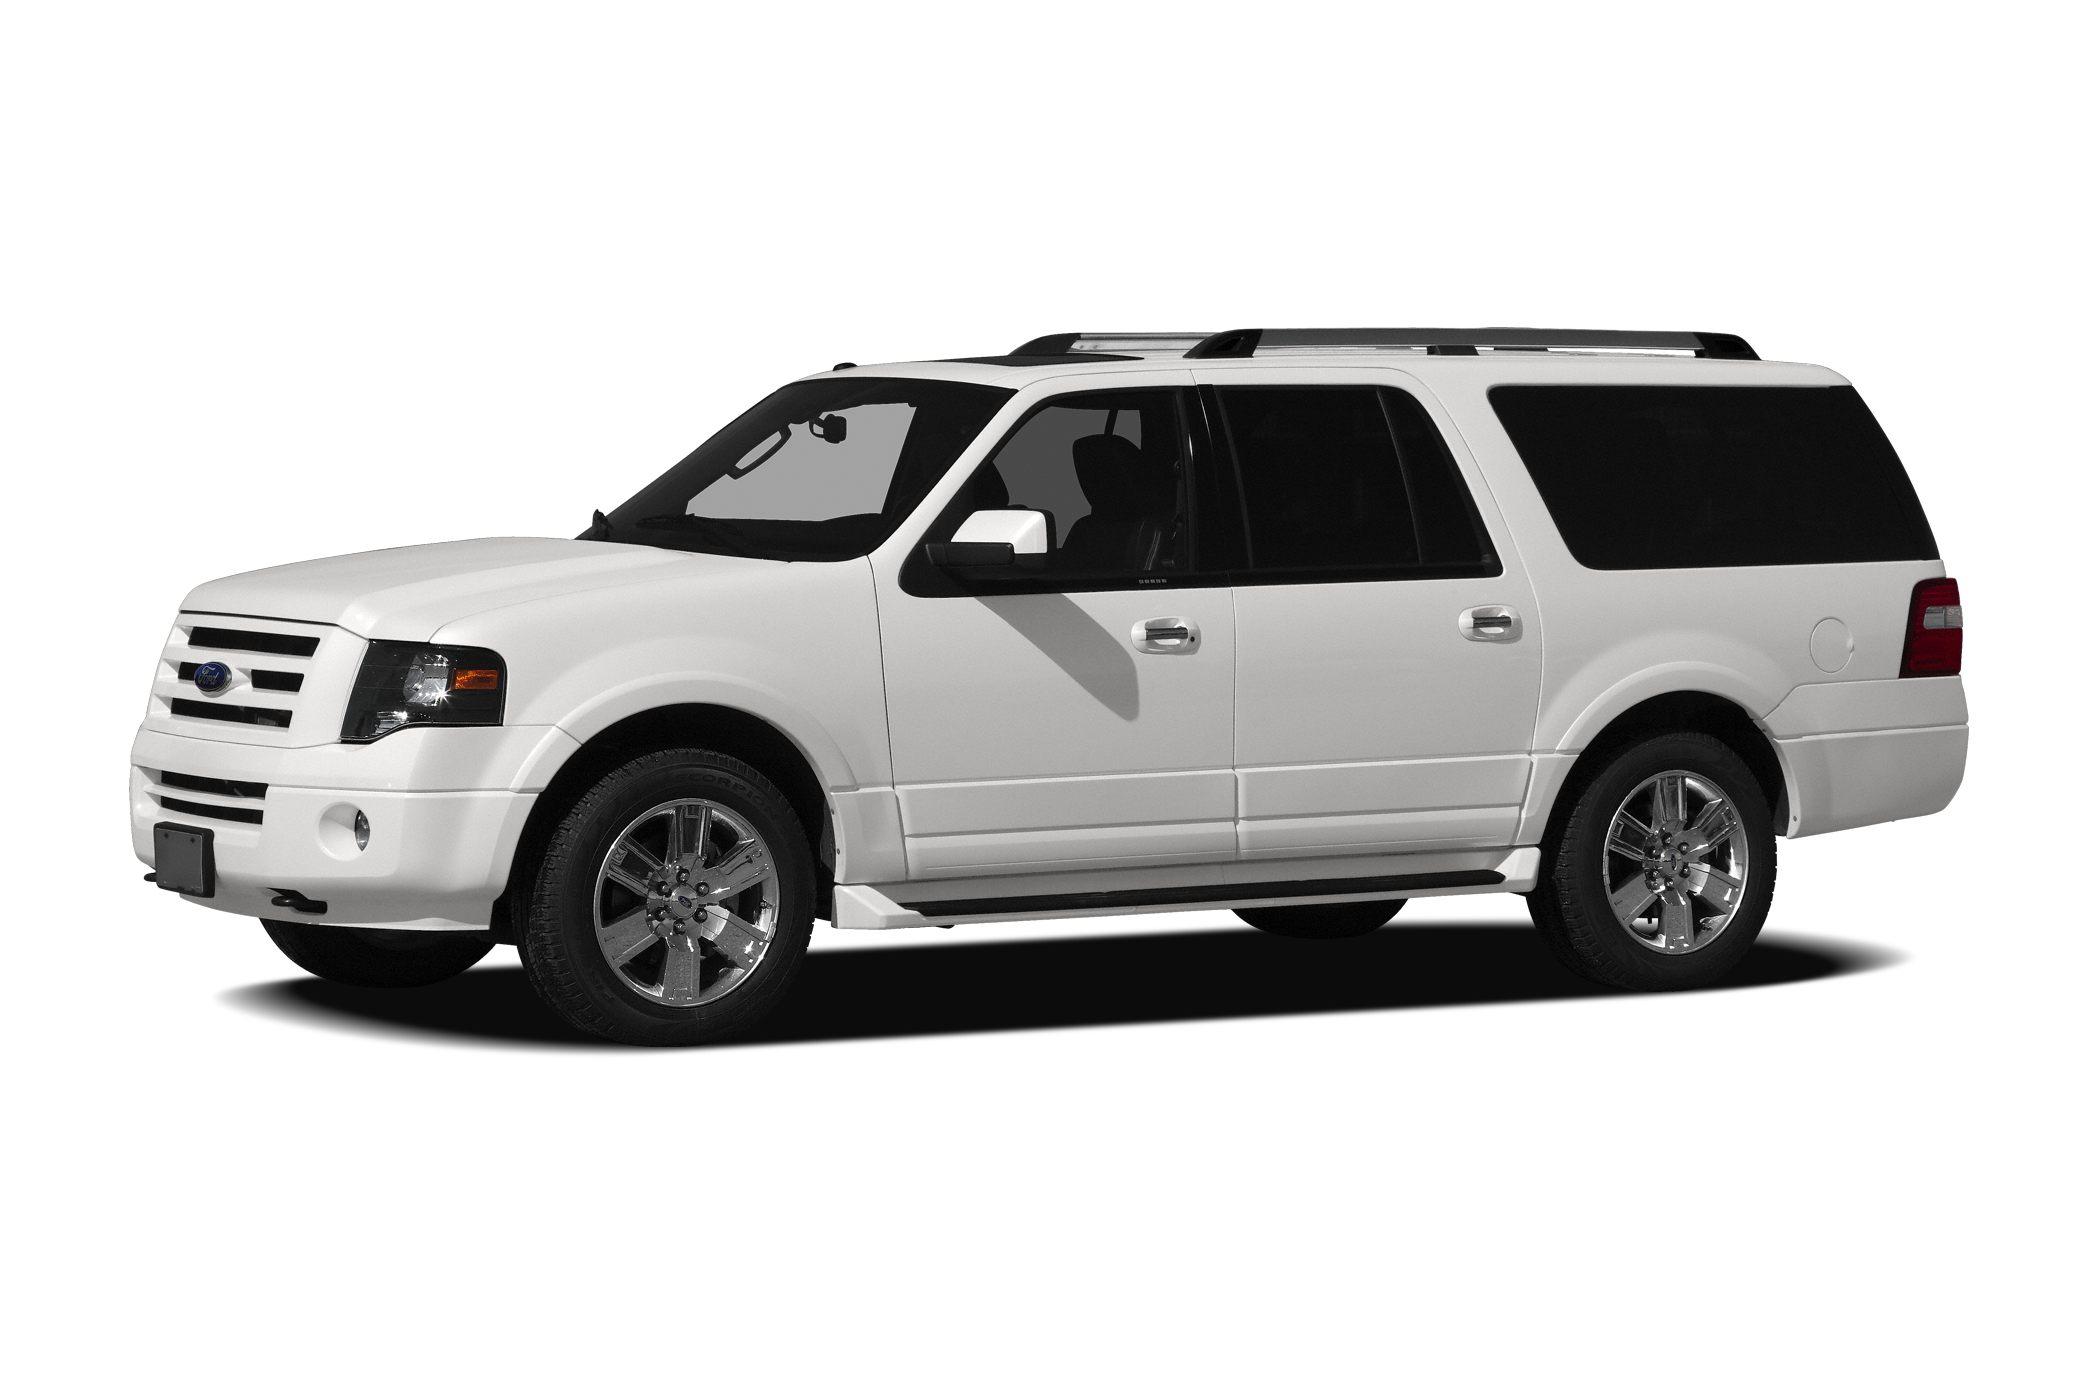 2010 Ford Expedition EL